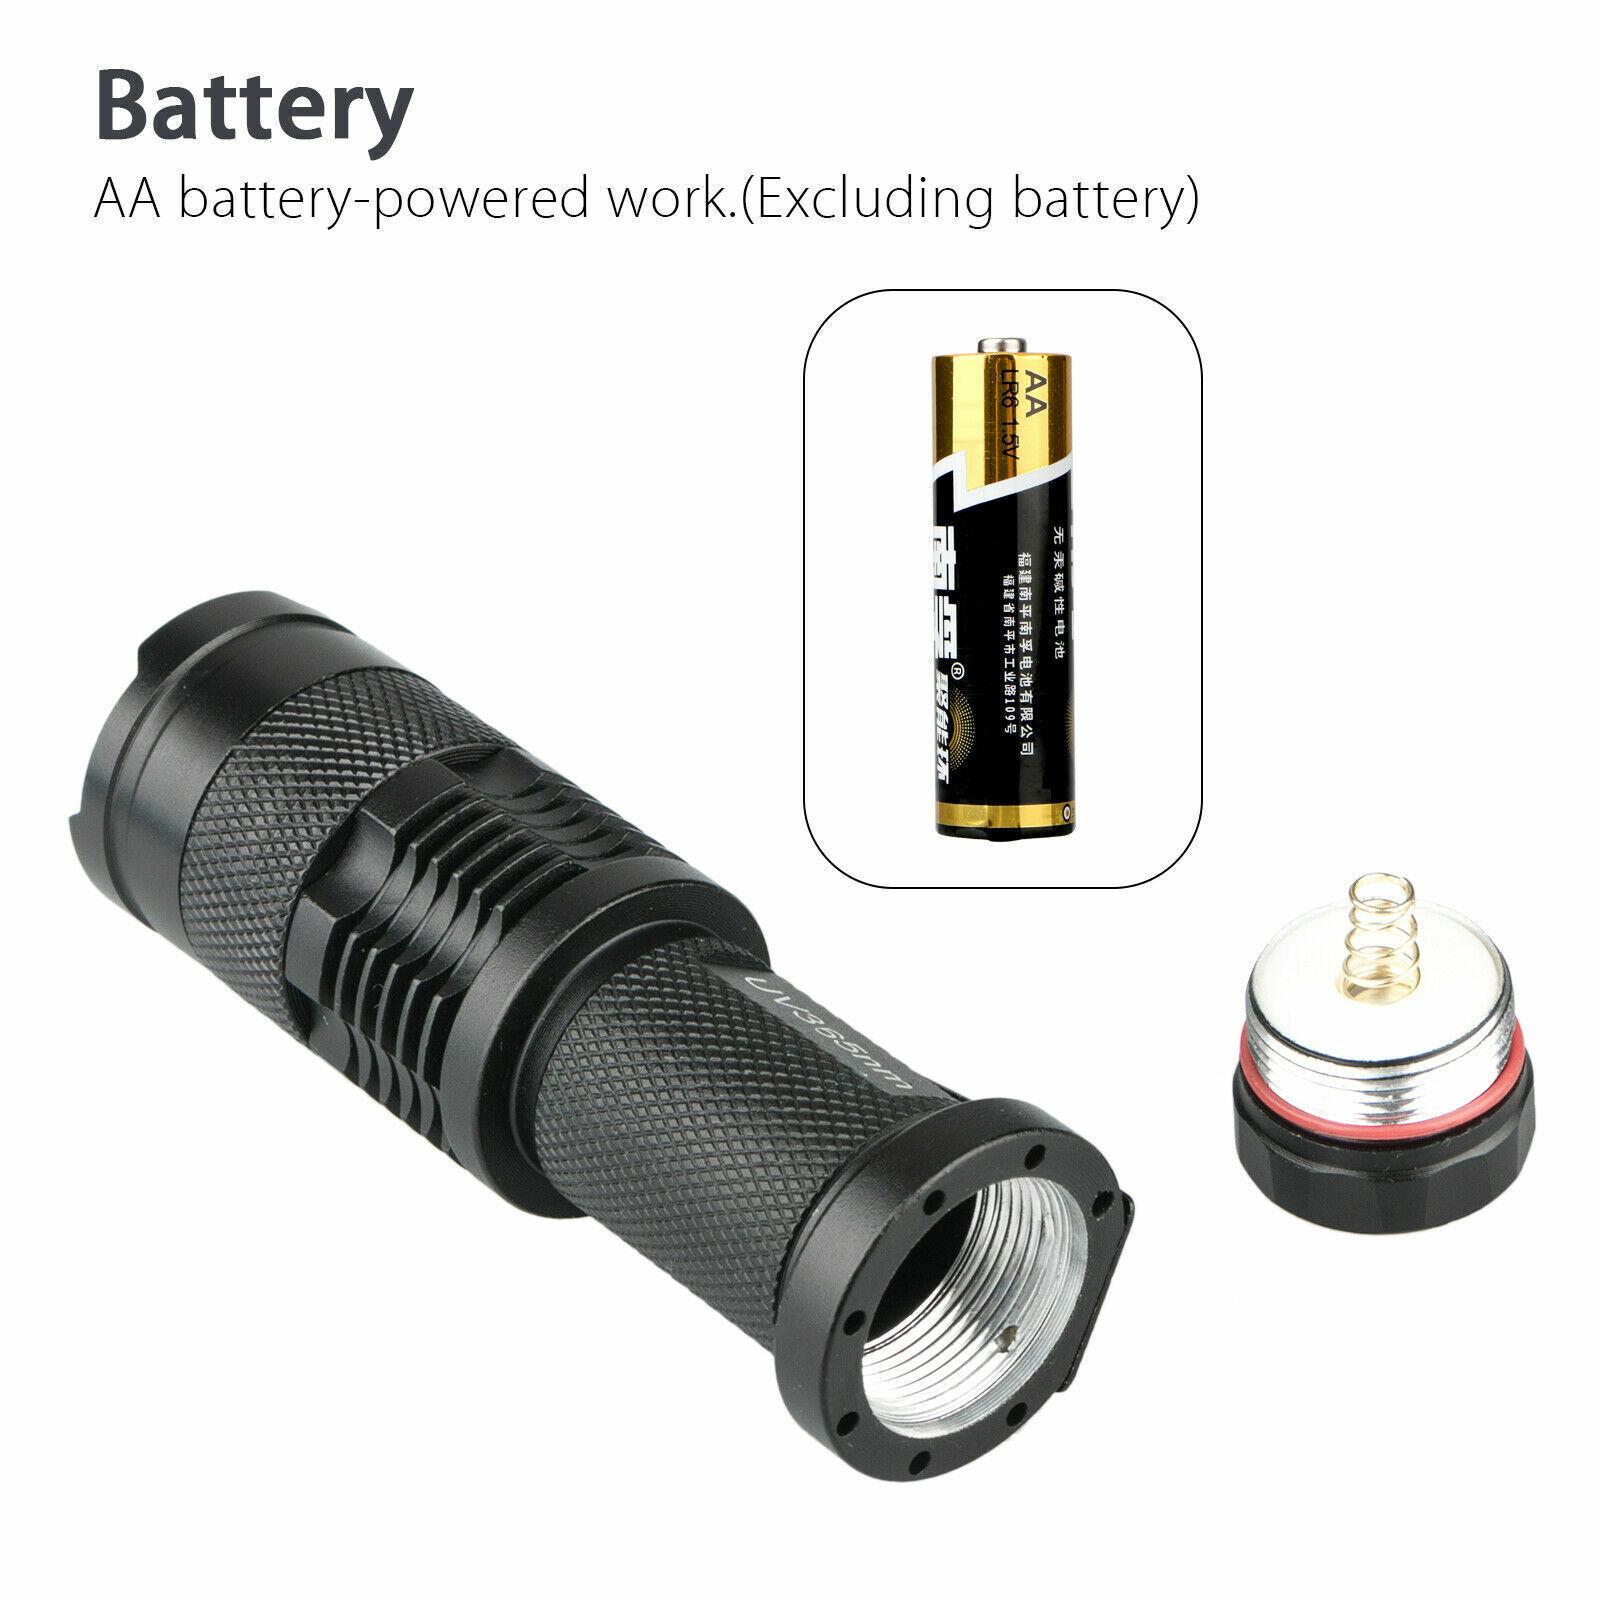 365nm LED High Powered UV Lamp Black Light Ultra Violet Flashlight Super Bright Camping & Hiking